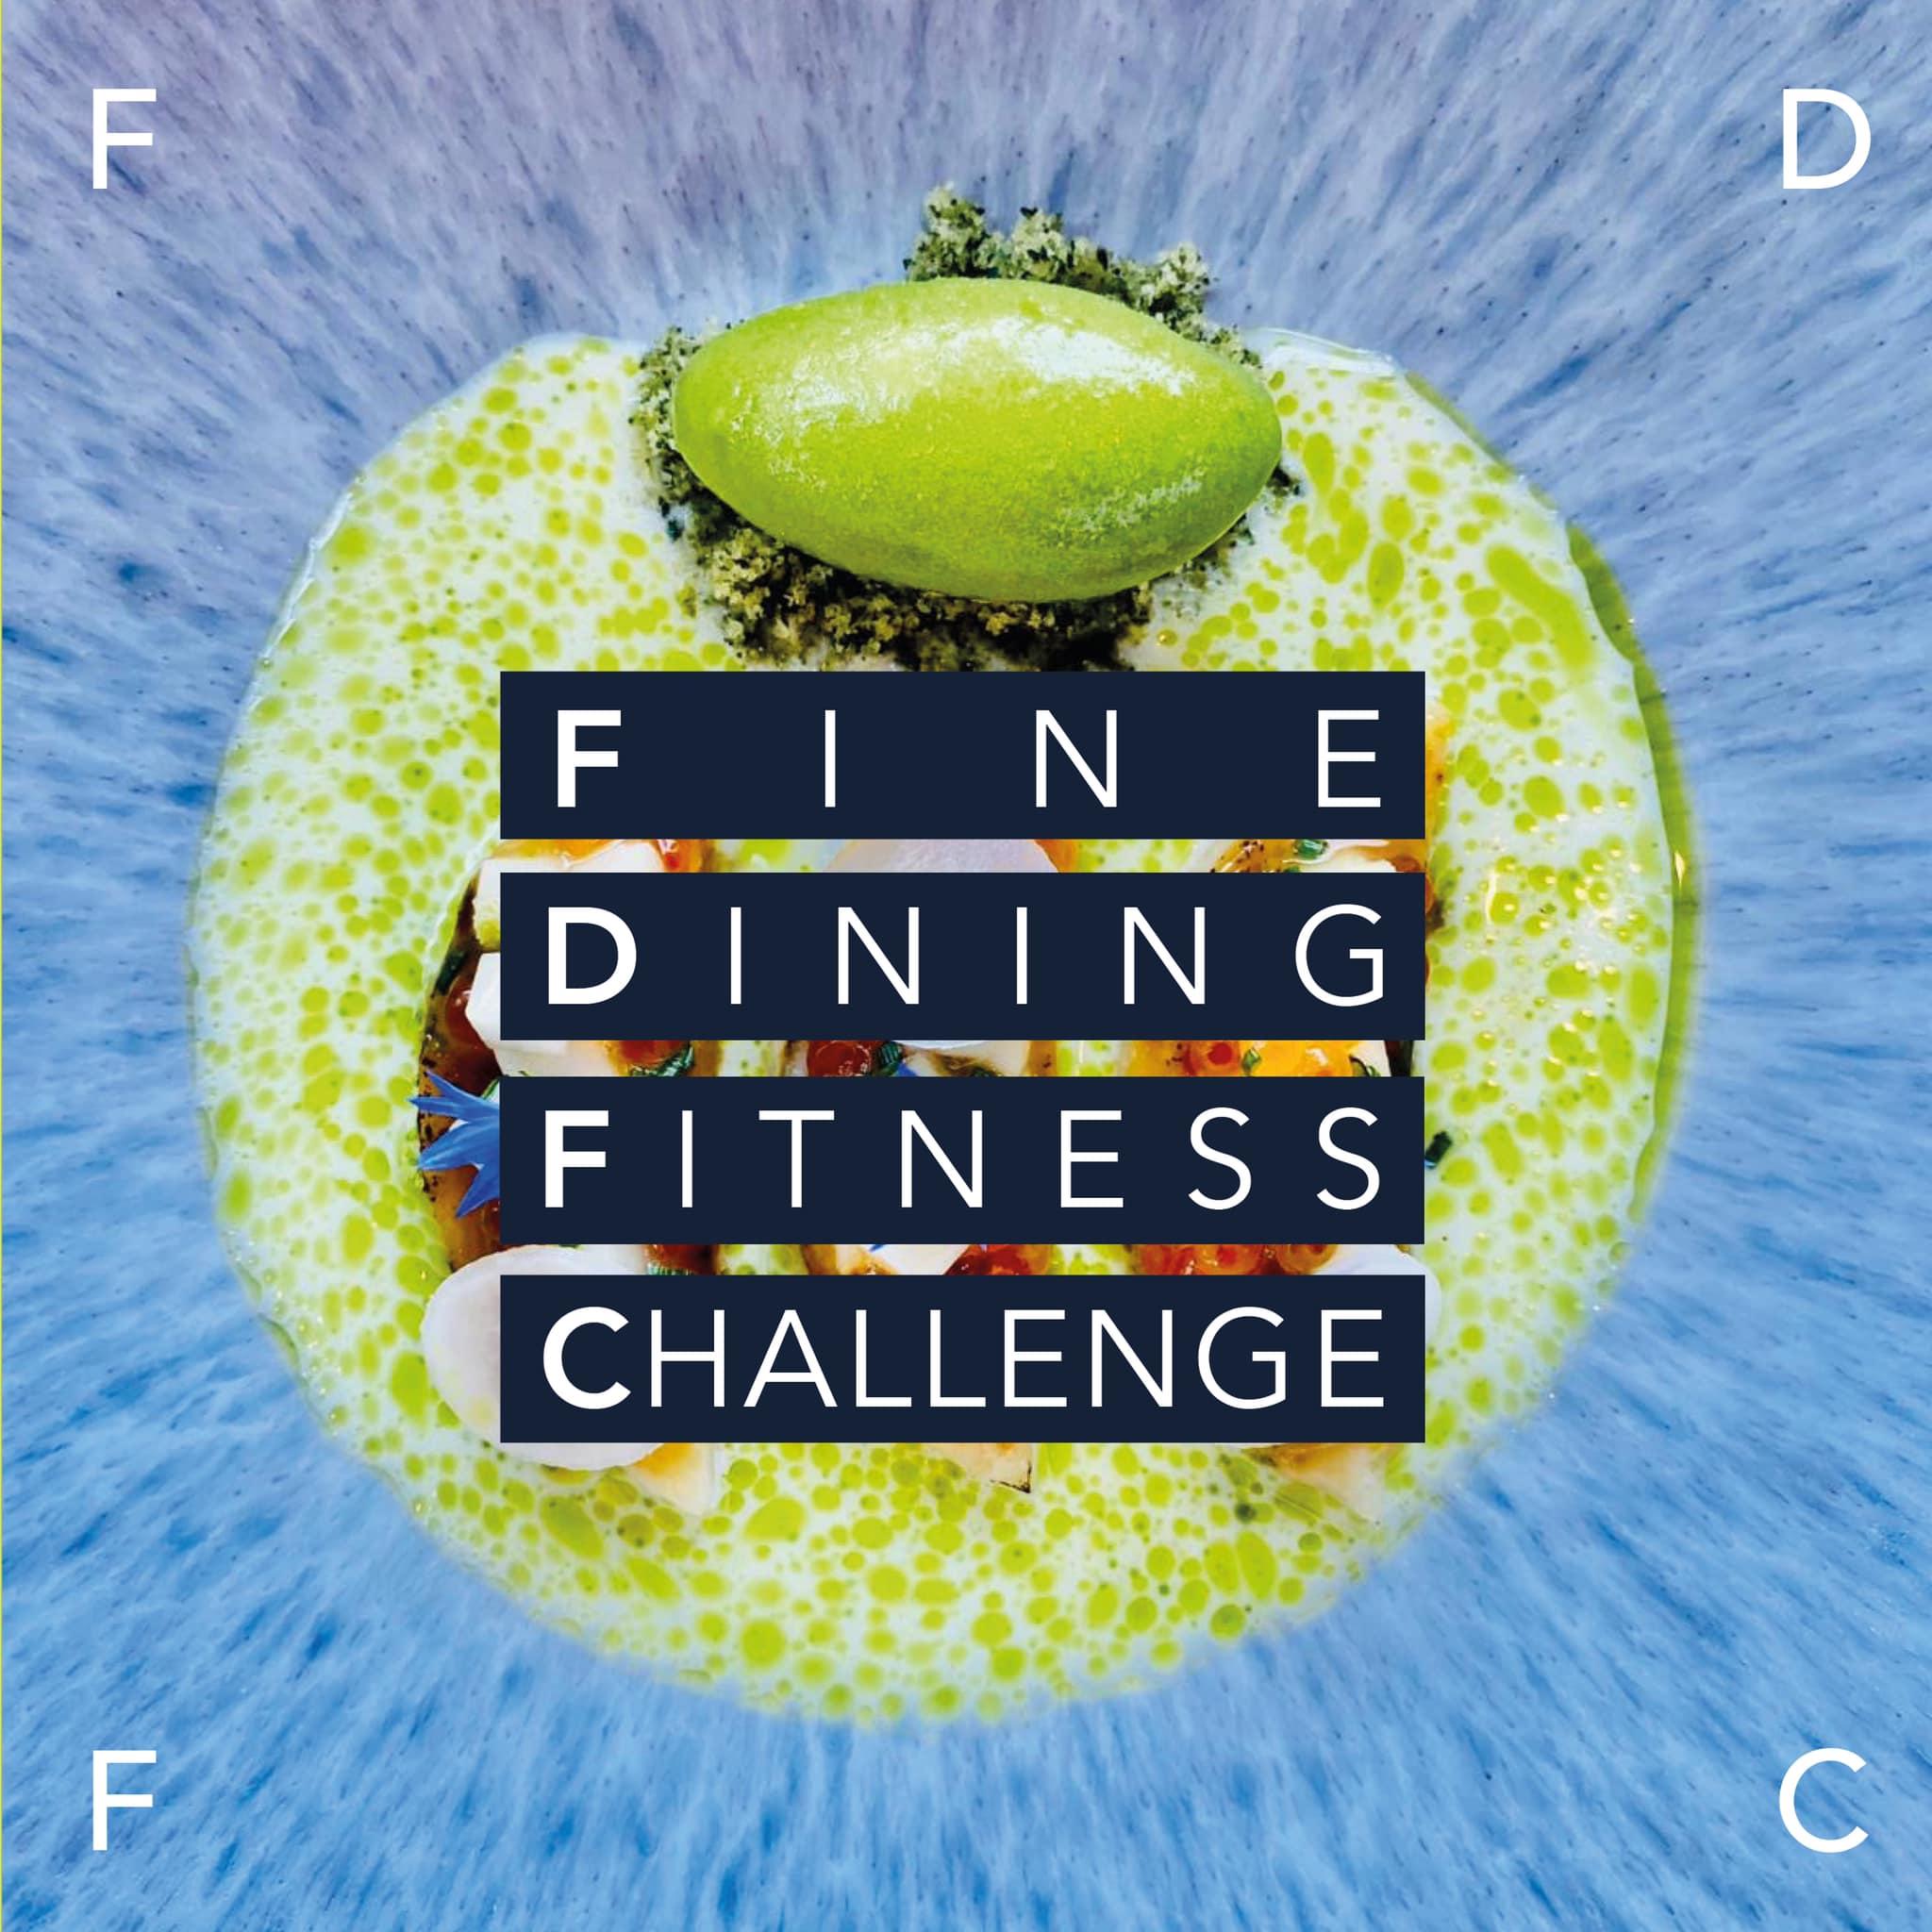 Start the FINE DINING FITNESS CHALLENGE!